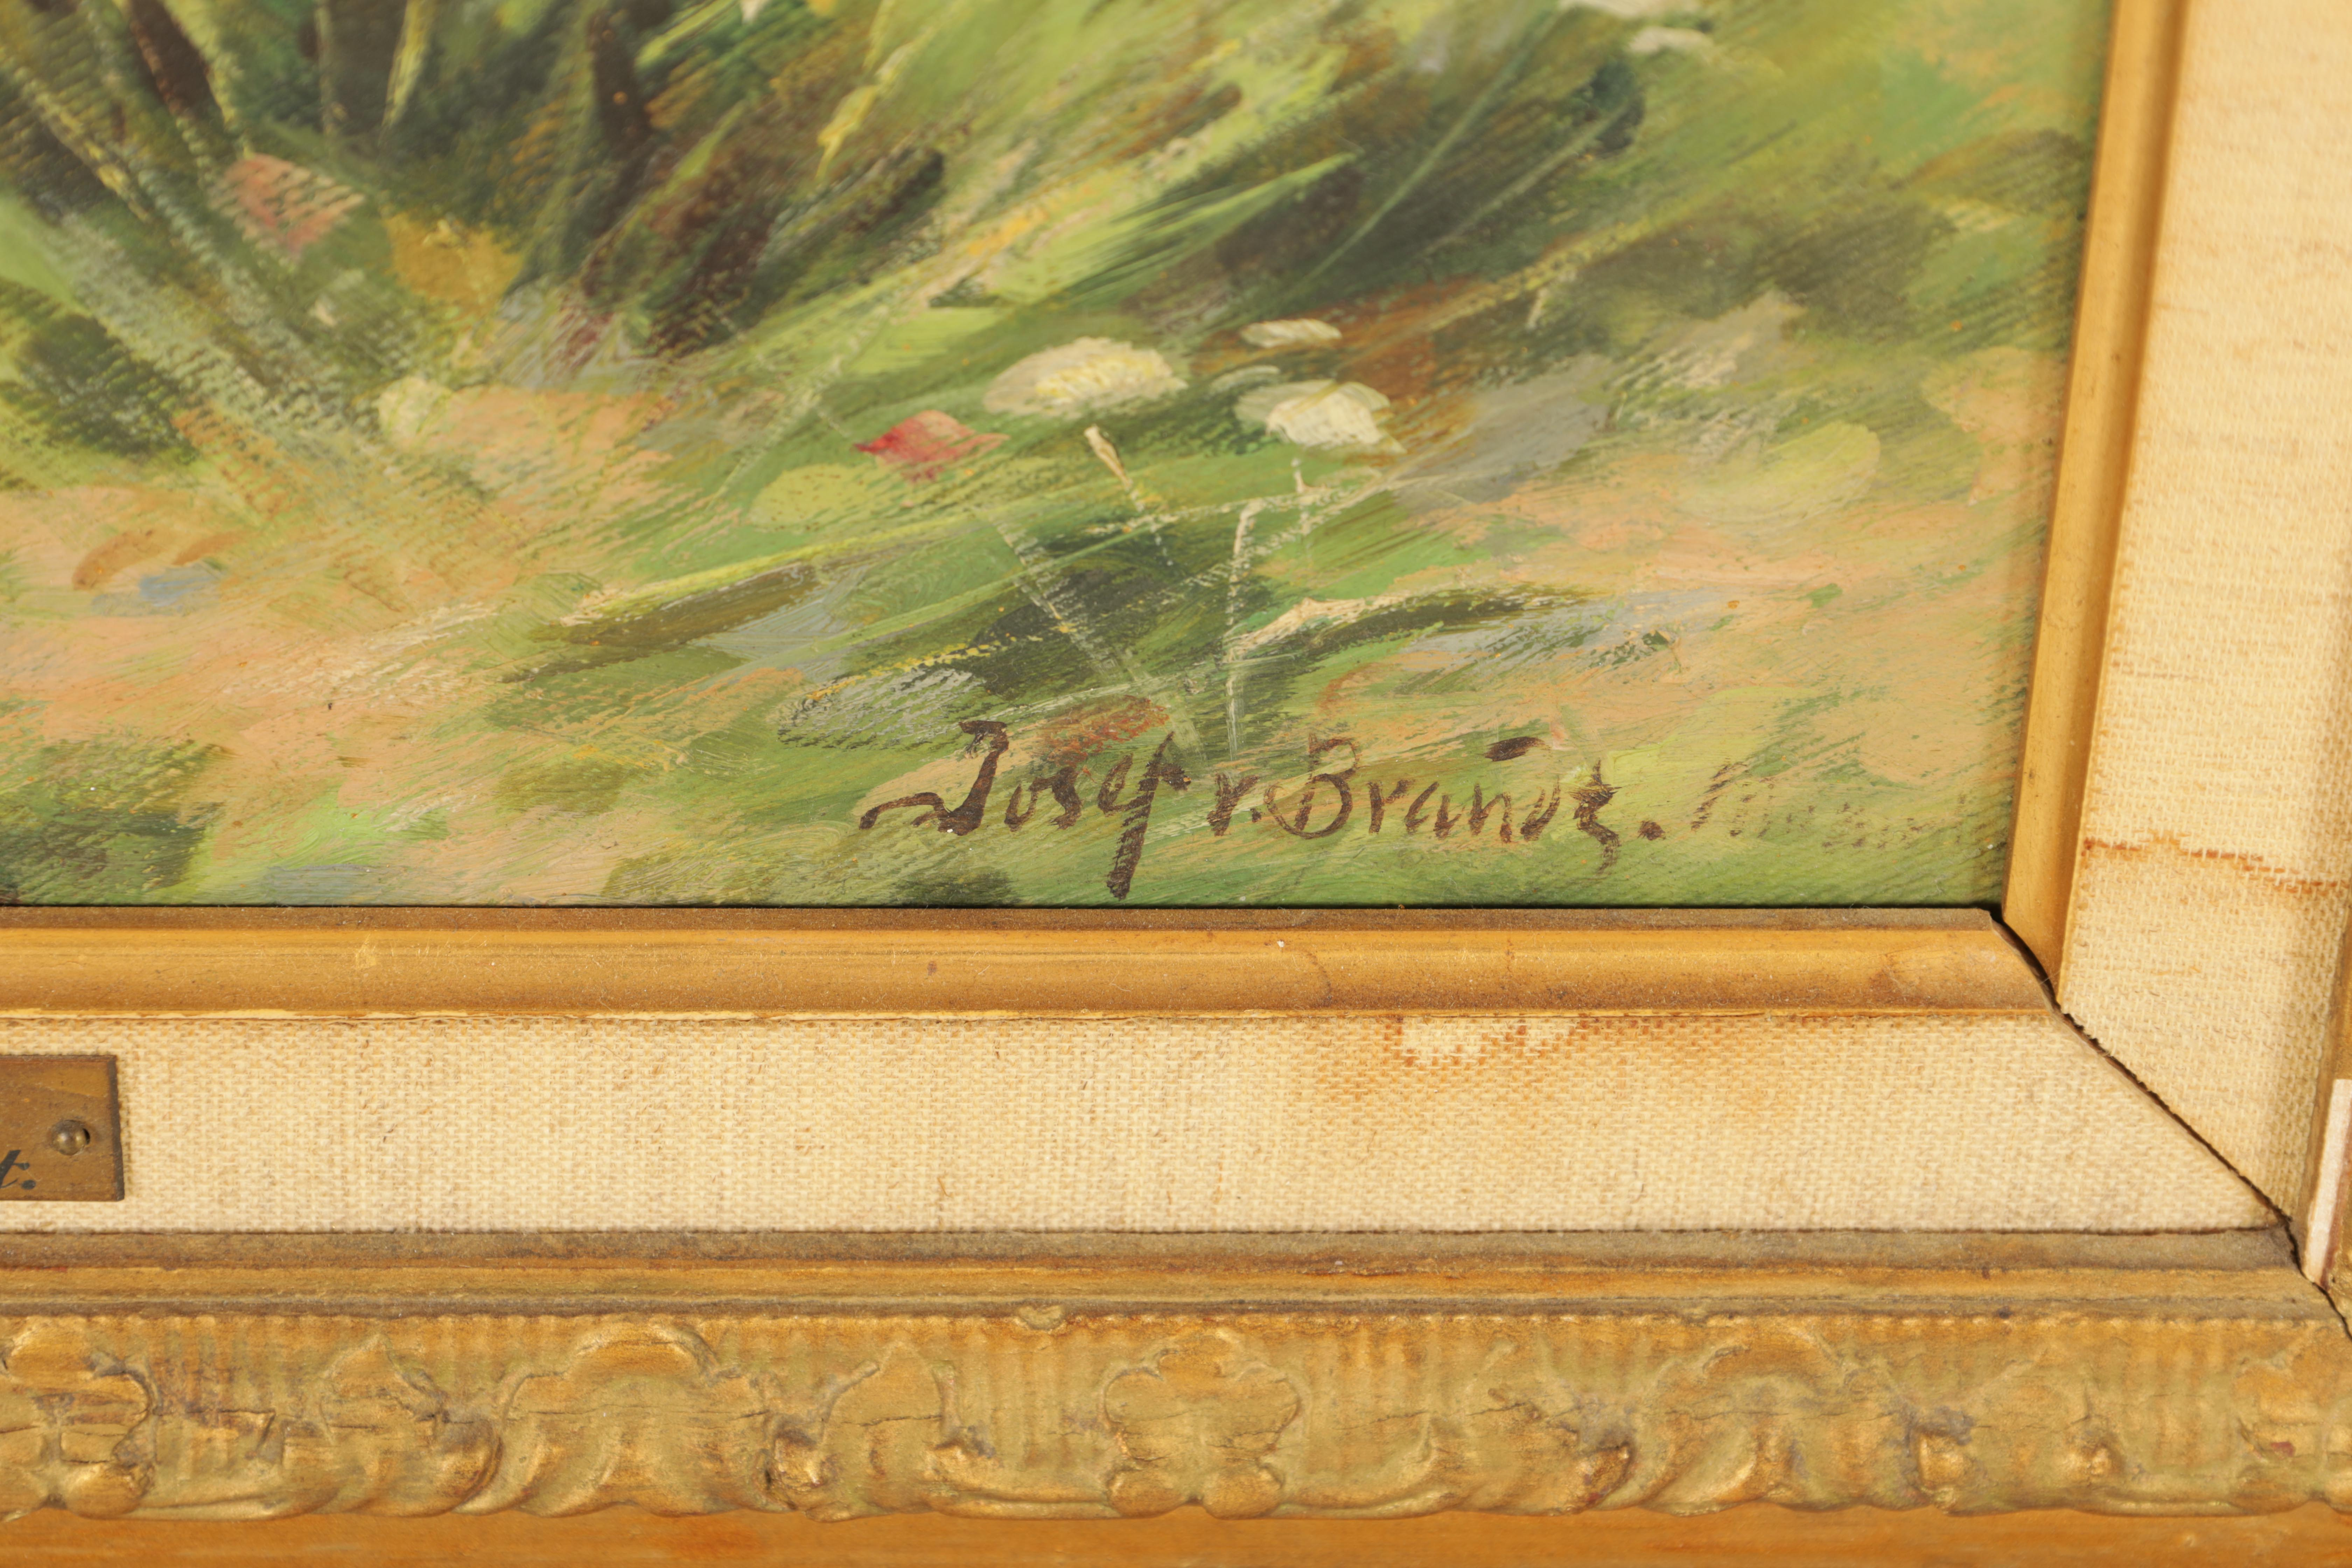 JOSEF VON BRANDT. POLISH, 1841-1928 OIL ON CANVAS Cossacks fording 49.5cm high, 33.5cm wide - signed - Image 3 of 5